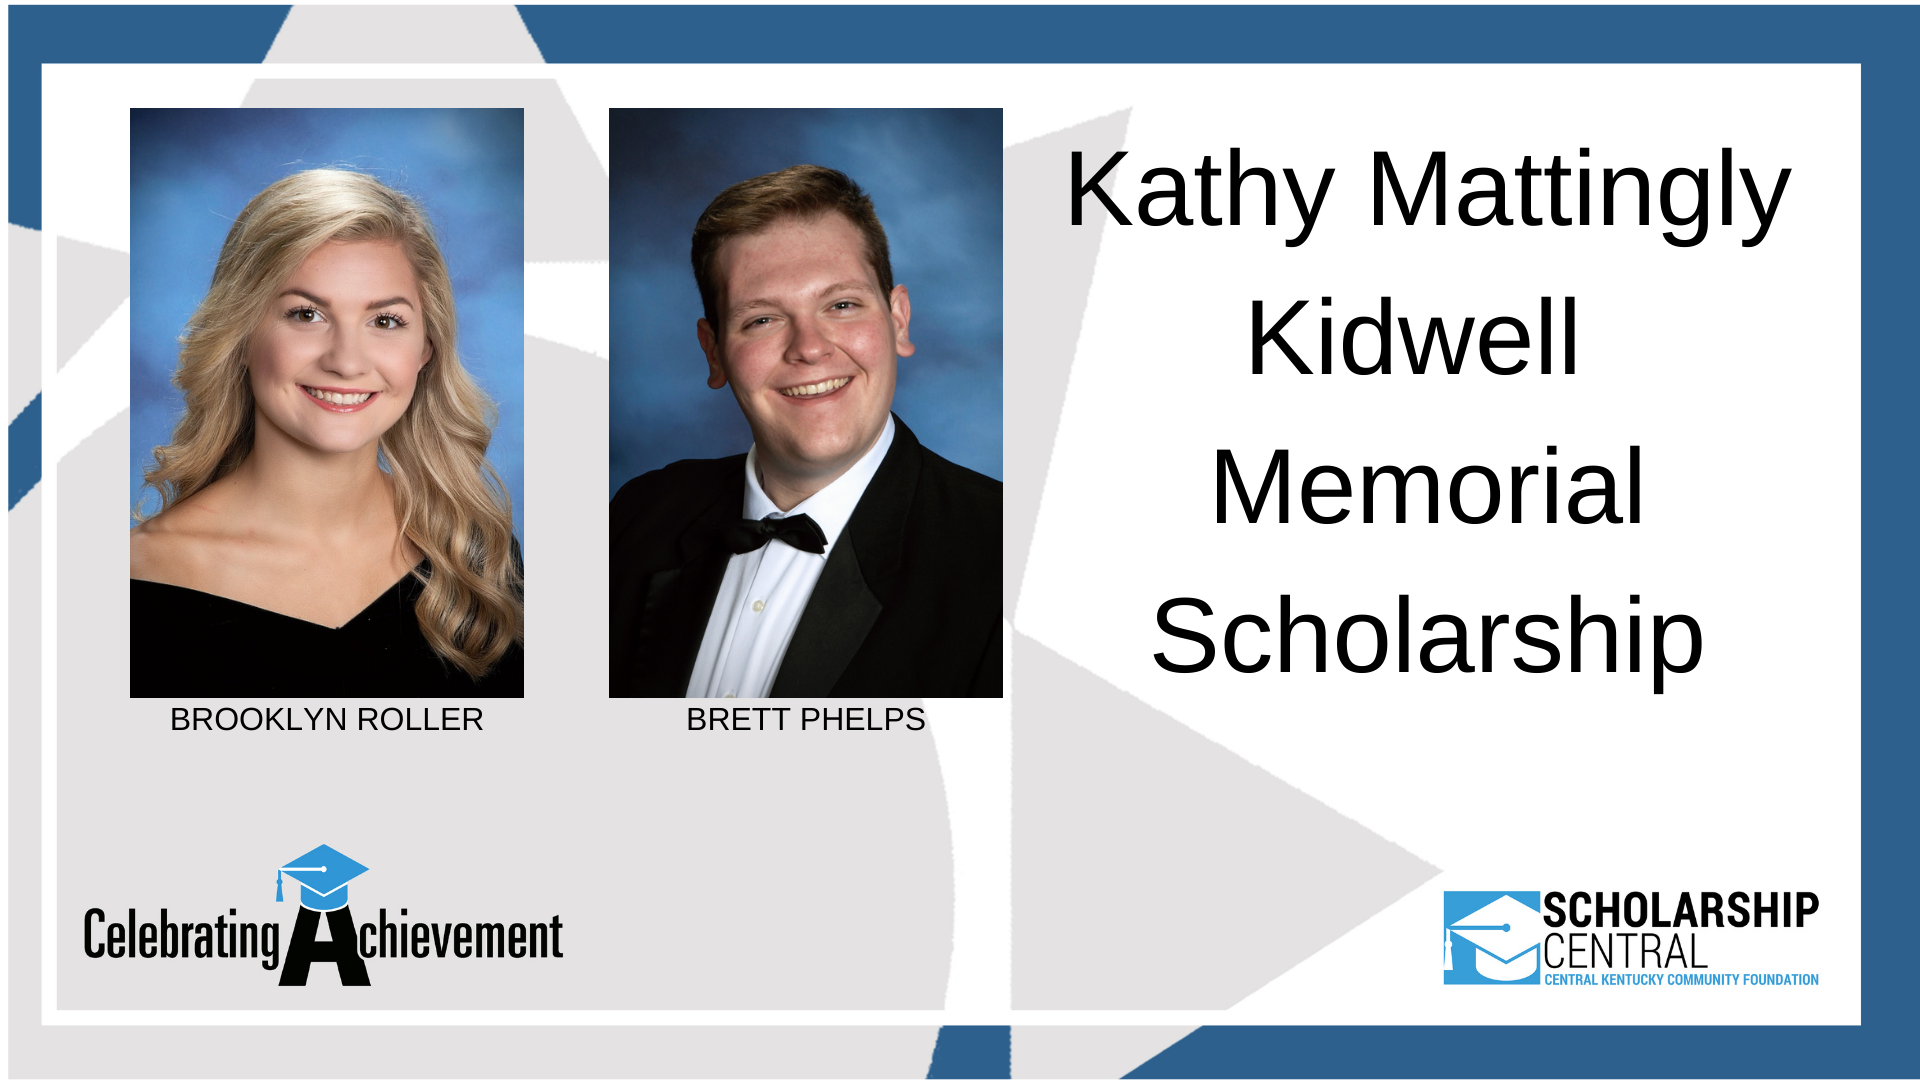 Kathy Mattingly Kidwell Memorial Scholarship Winners